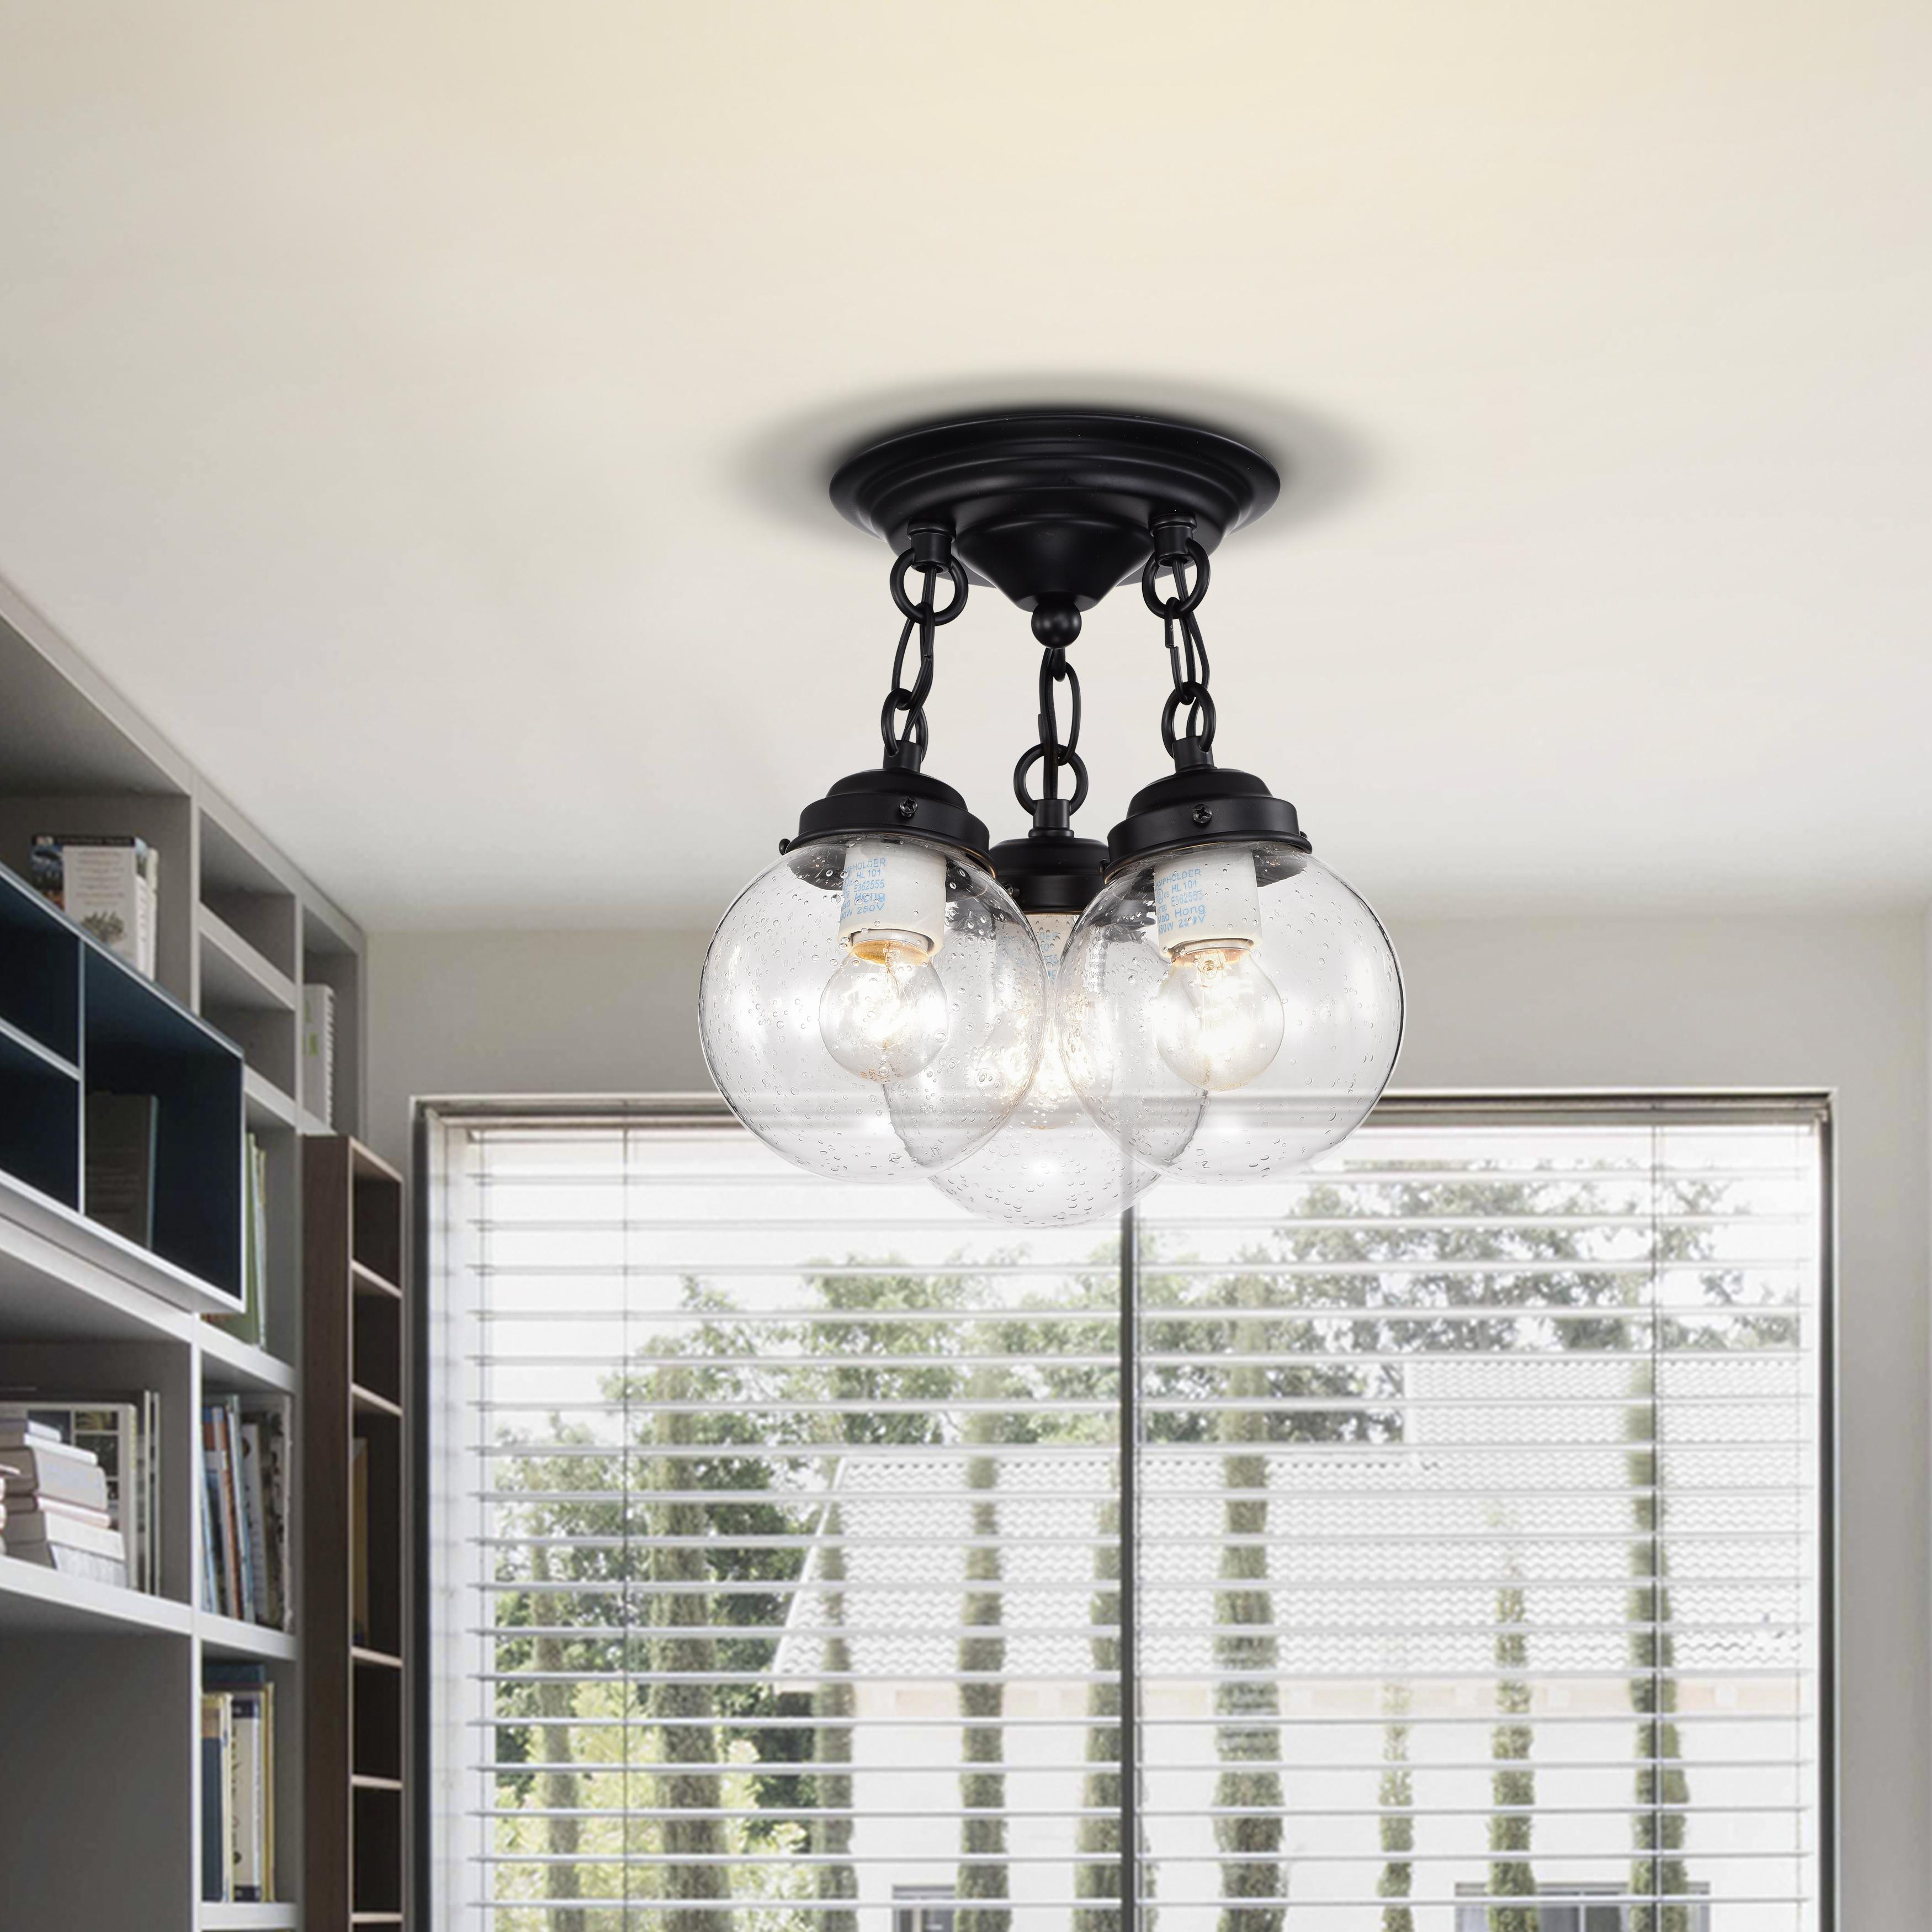 Abver Matte Black 3-Light Clear Glass Globe Semi-Flush Mount